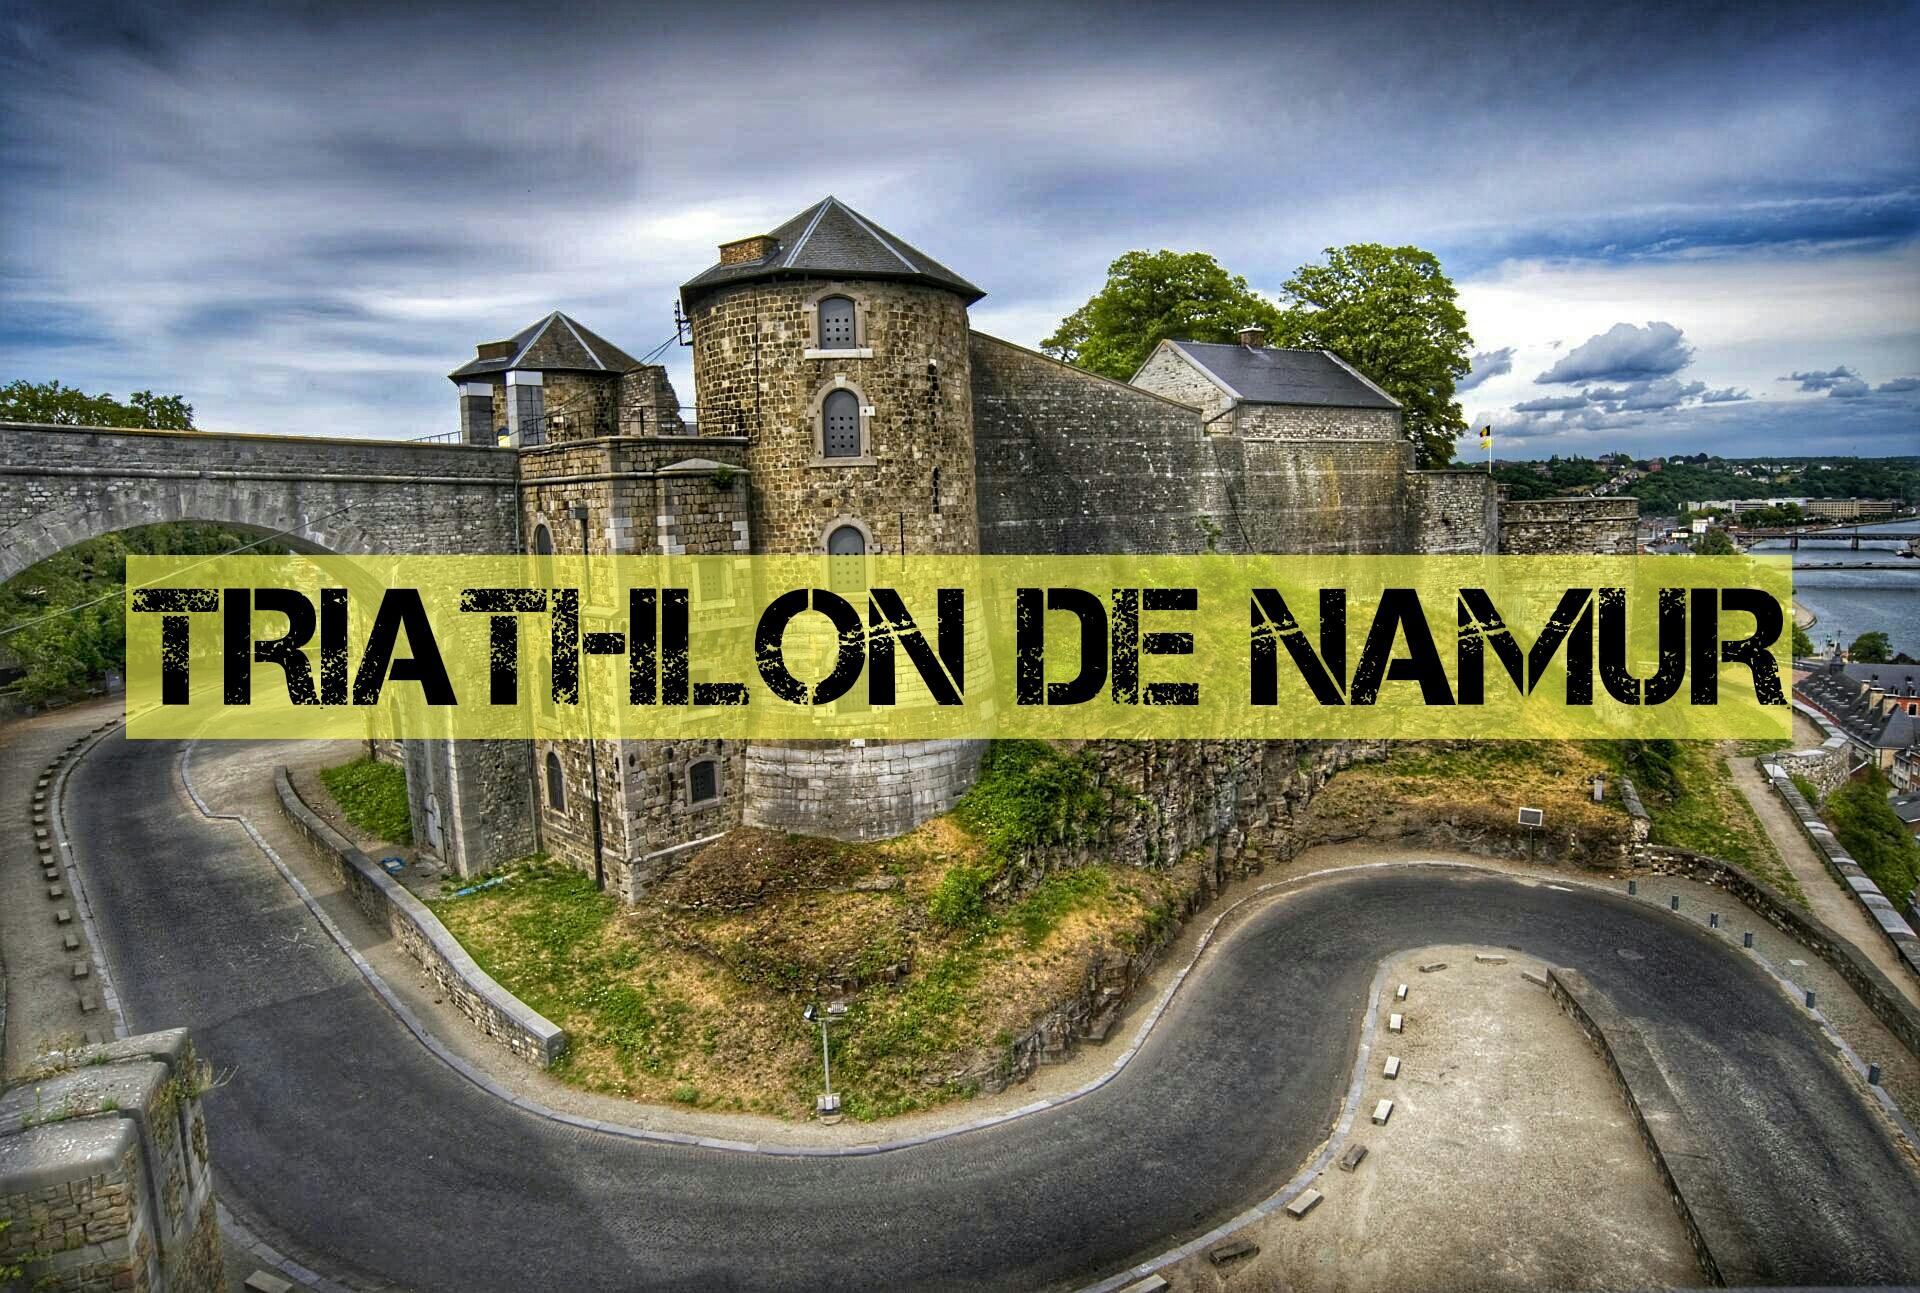 Triathlon de Namur